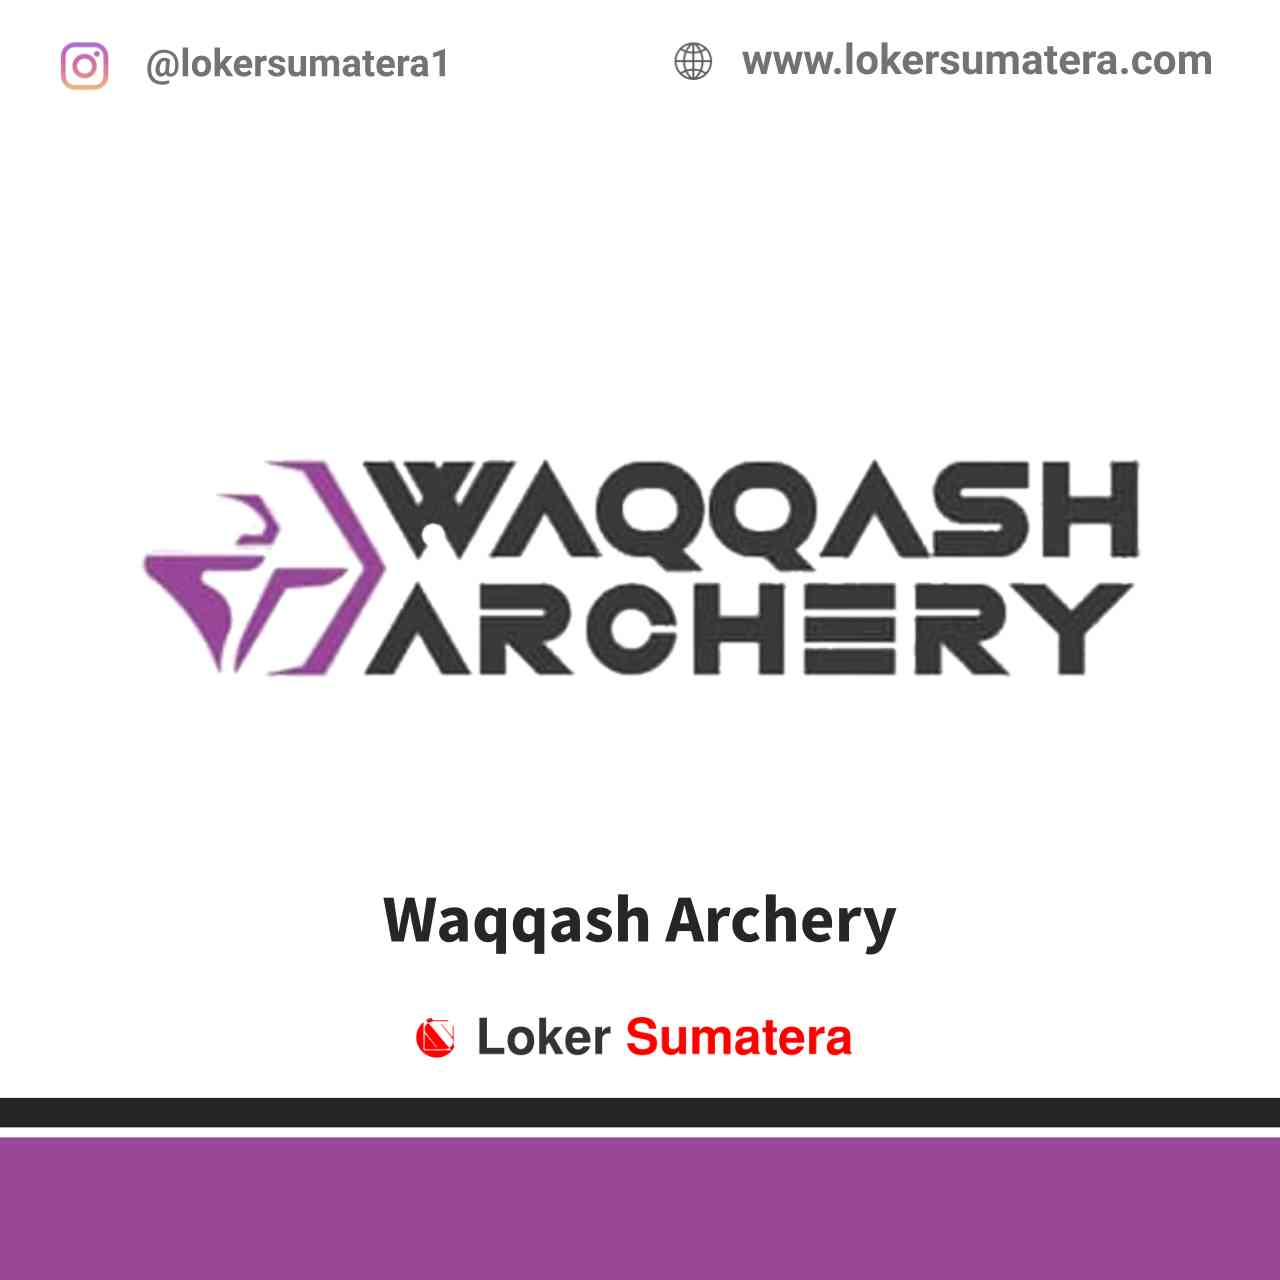 Waqqash Archery Pekanbaru